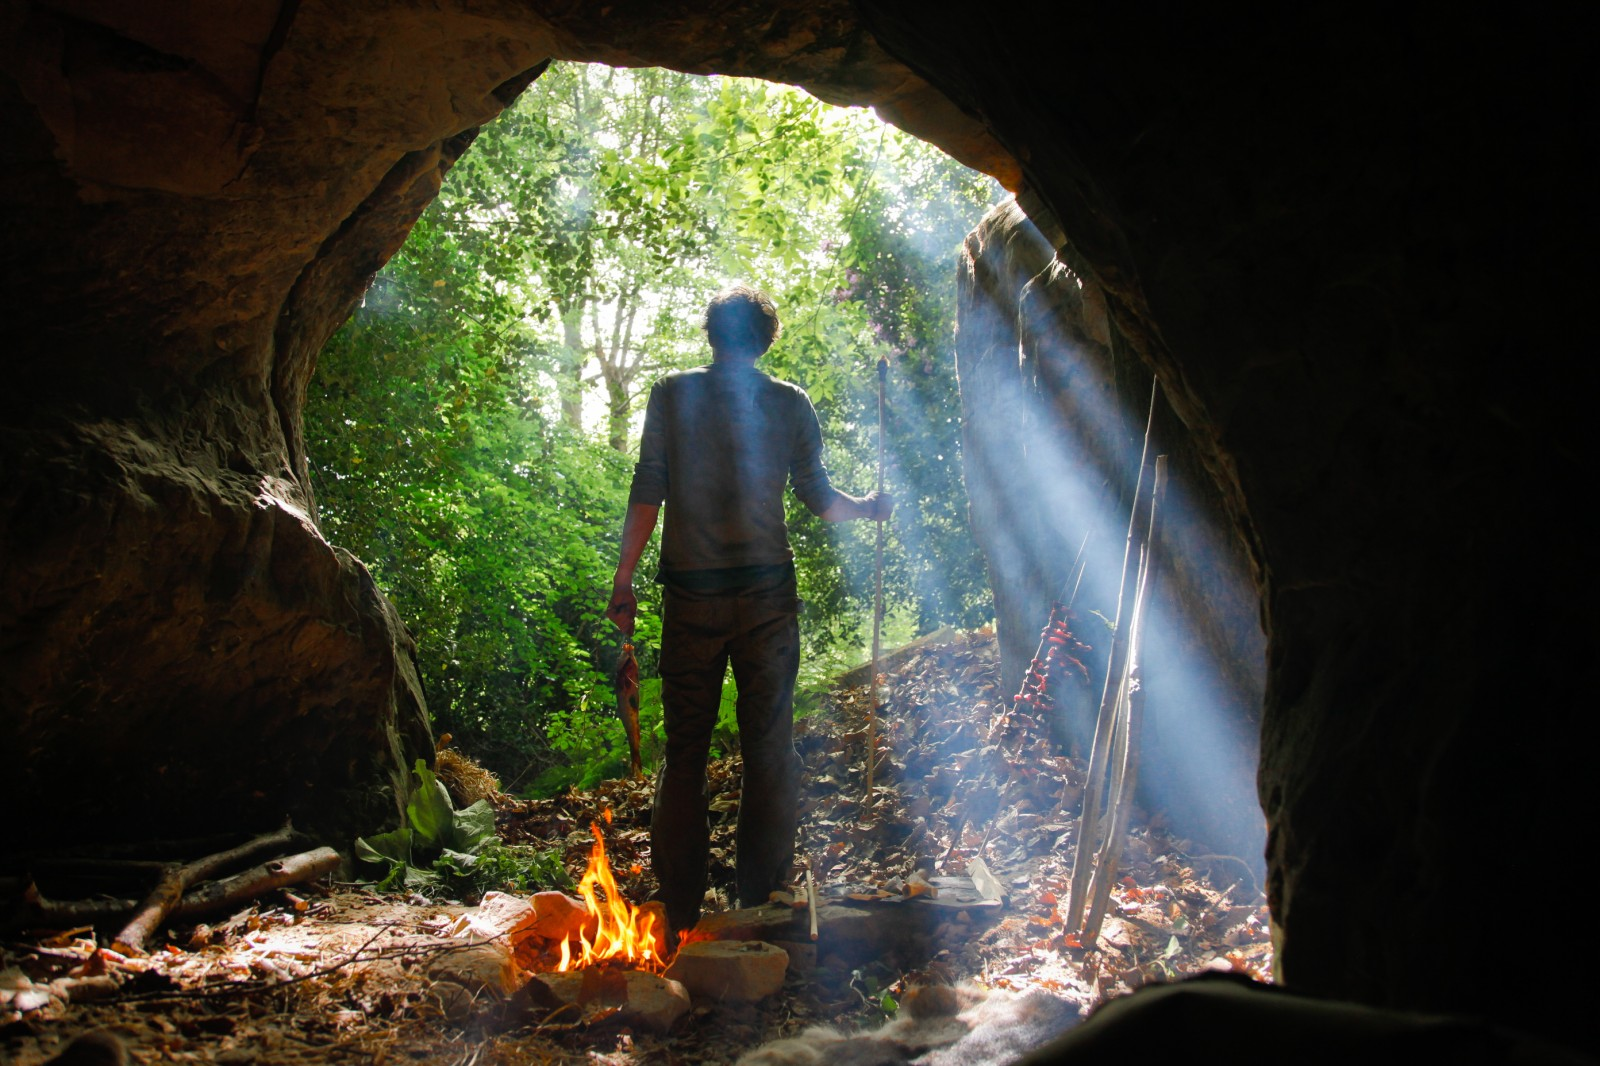 Caveman fire